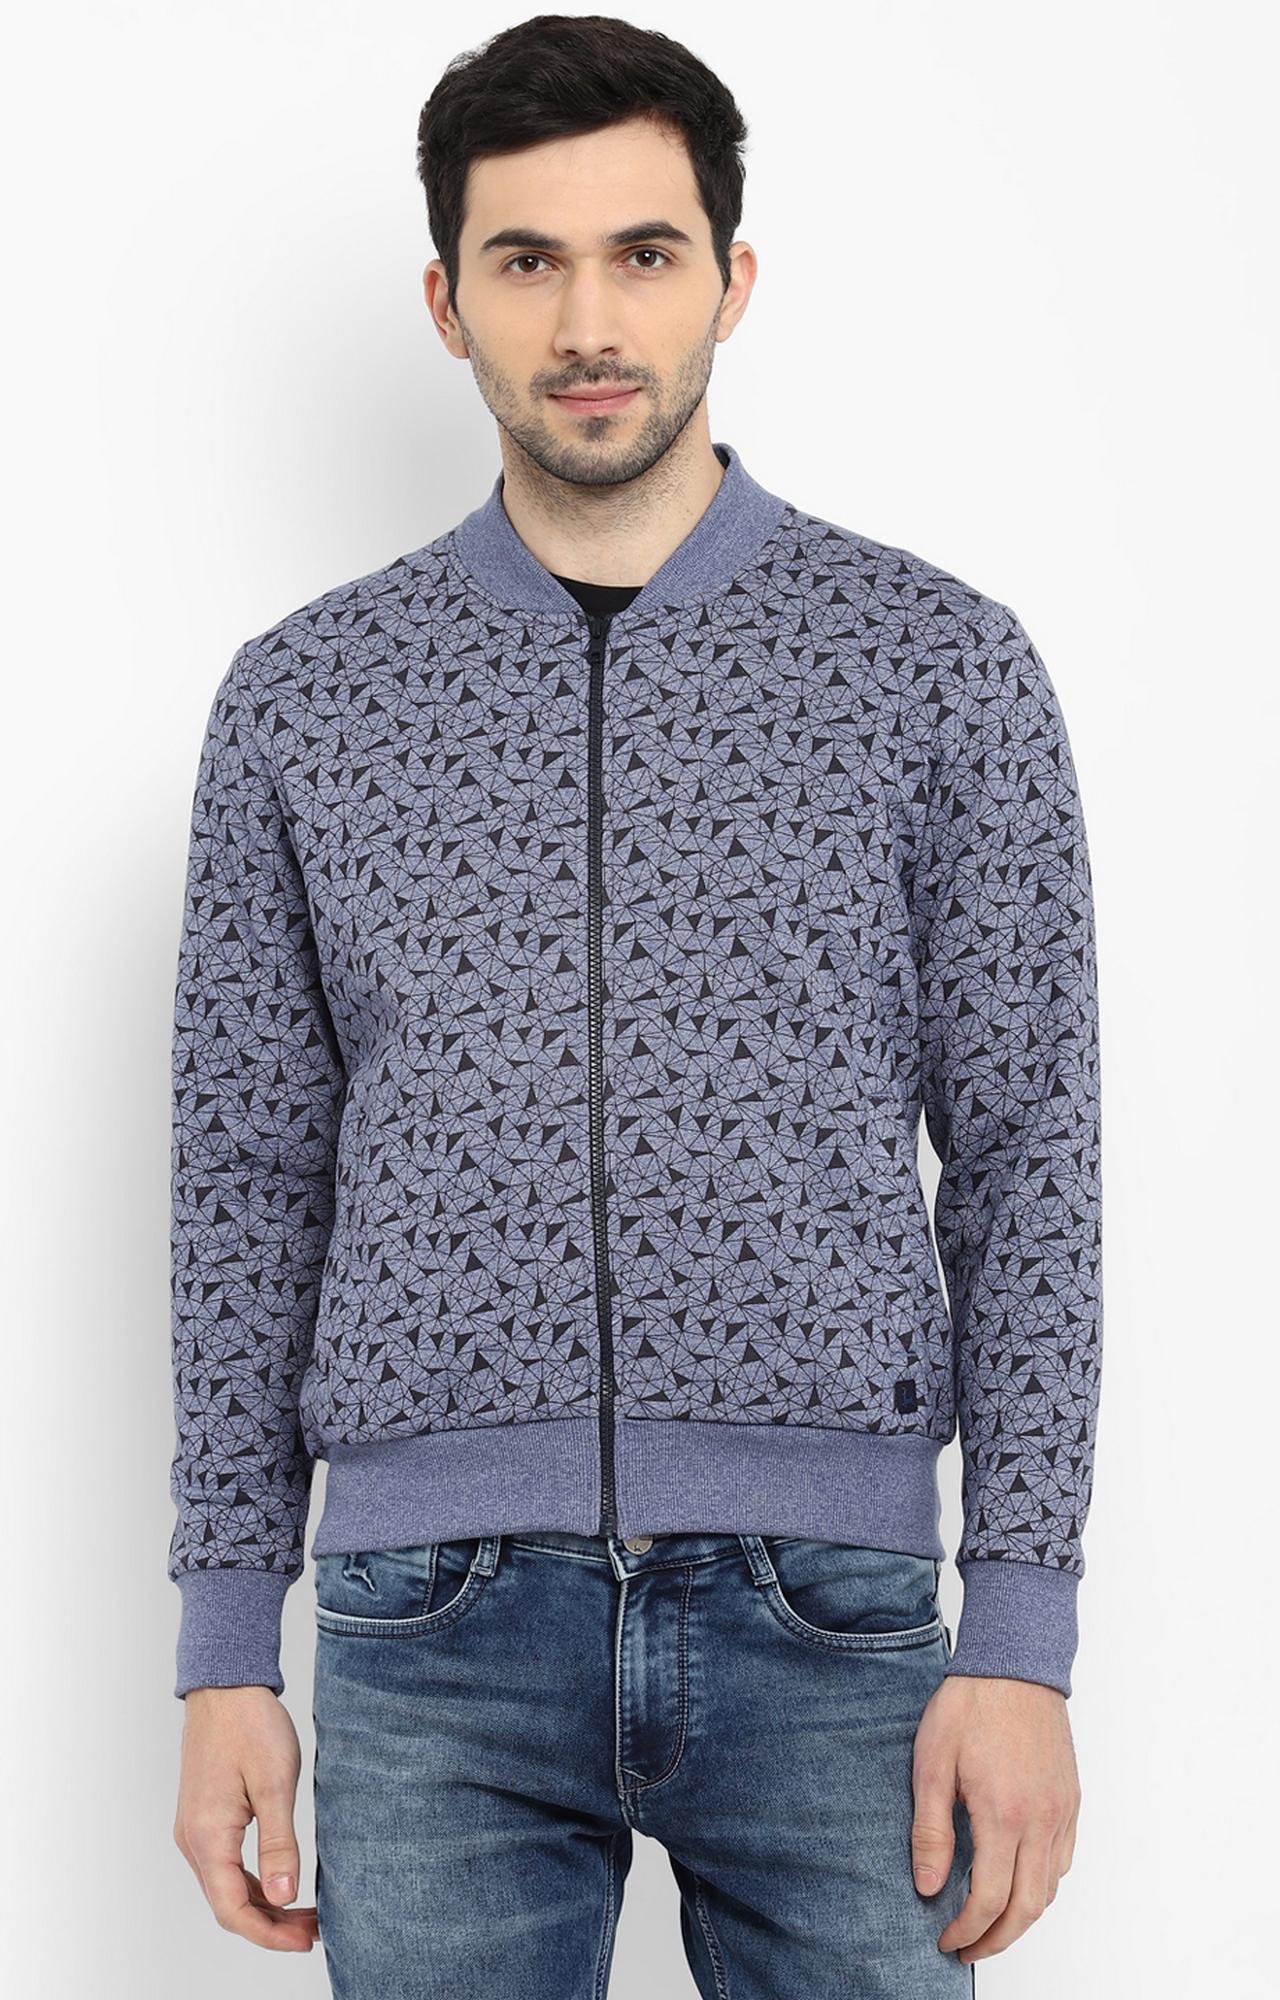 PARX | Medium Blue Printed Sweatshirt